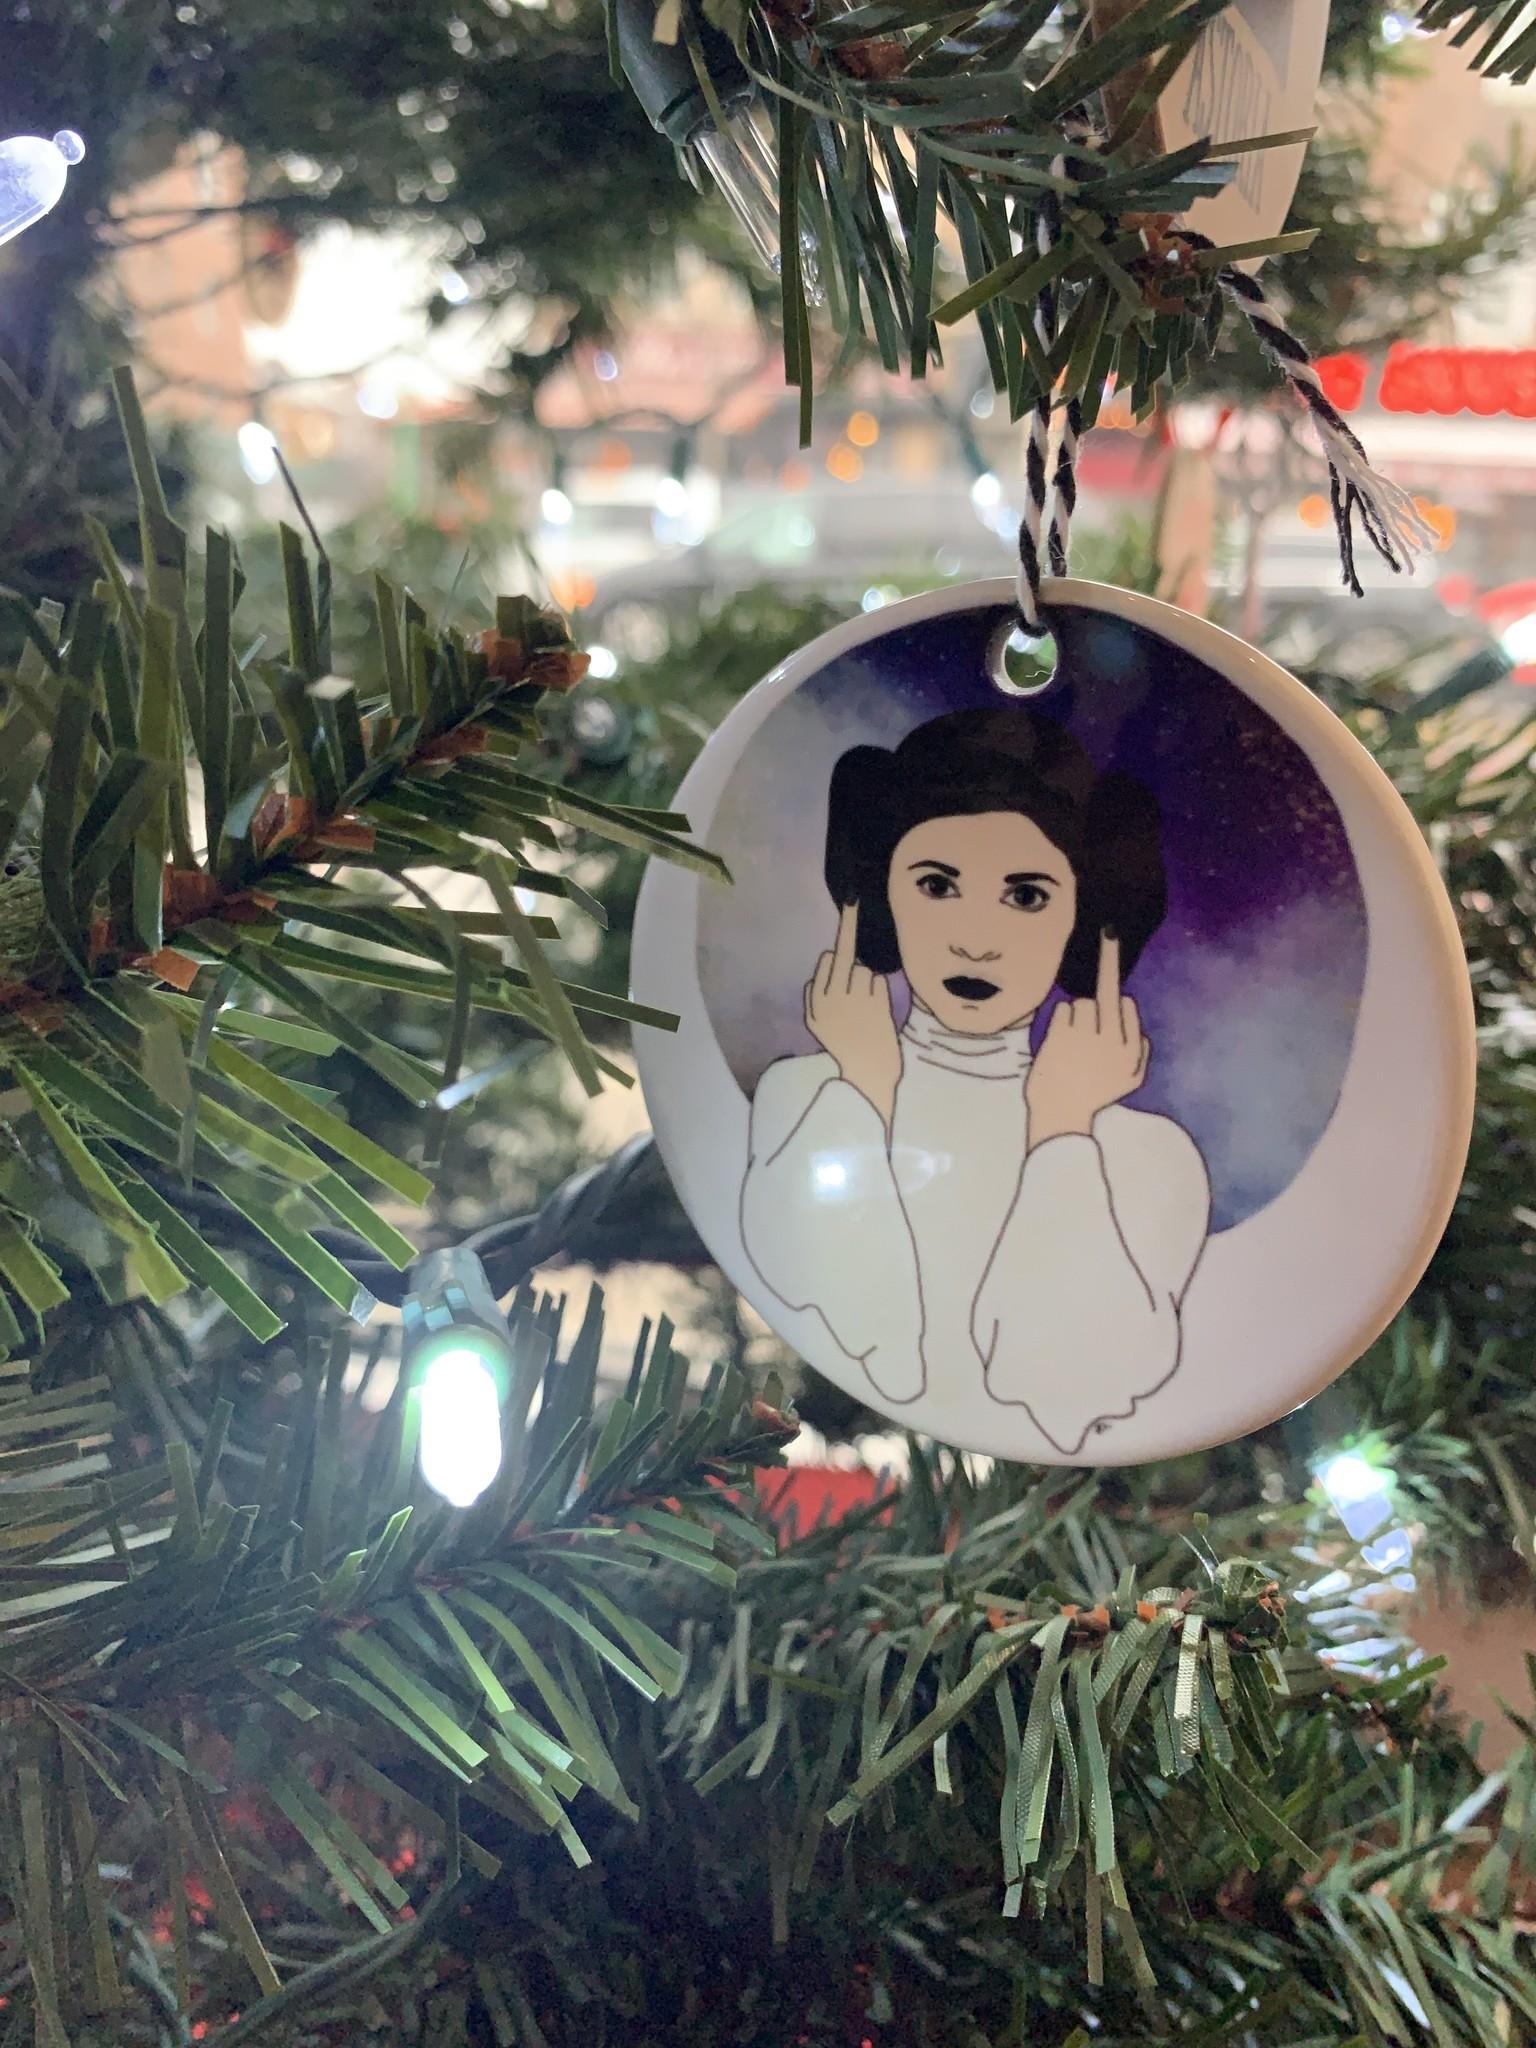 Citizen Ruth Princess Leia Ornament